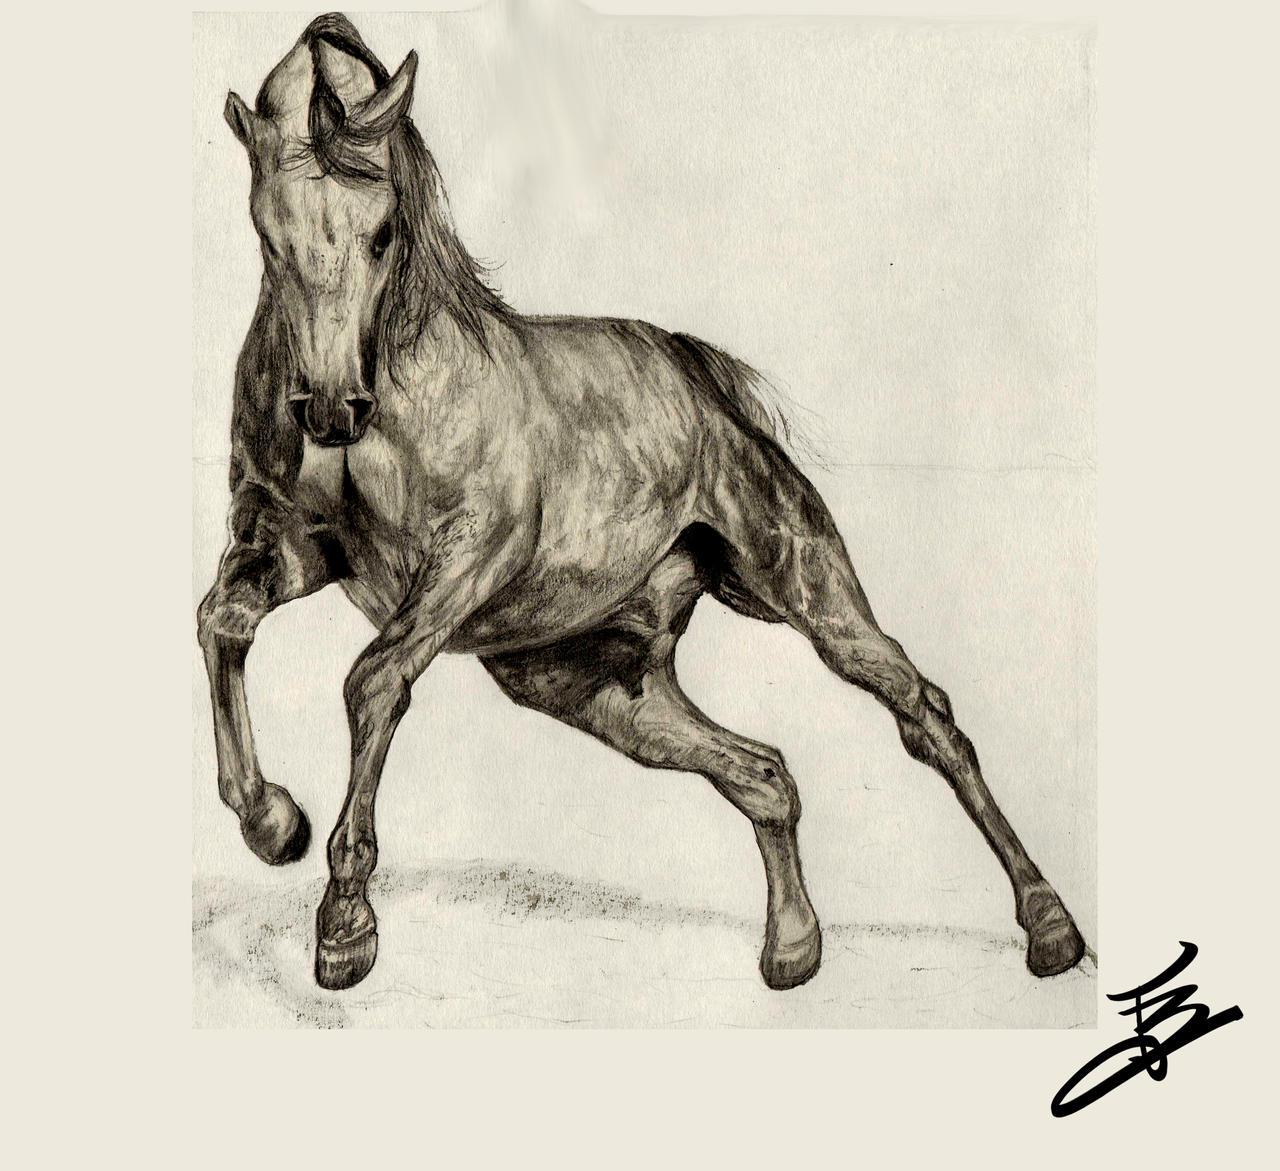 Realistic Horse by lvito00 on DeviantArt